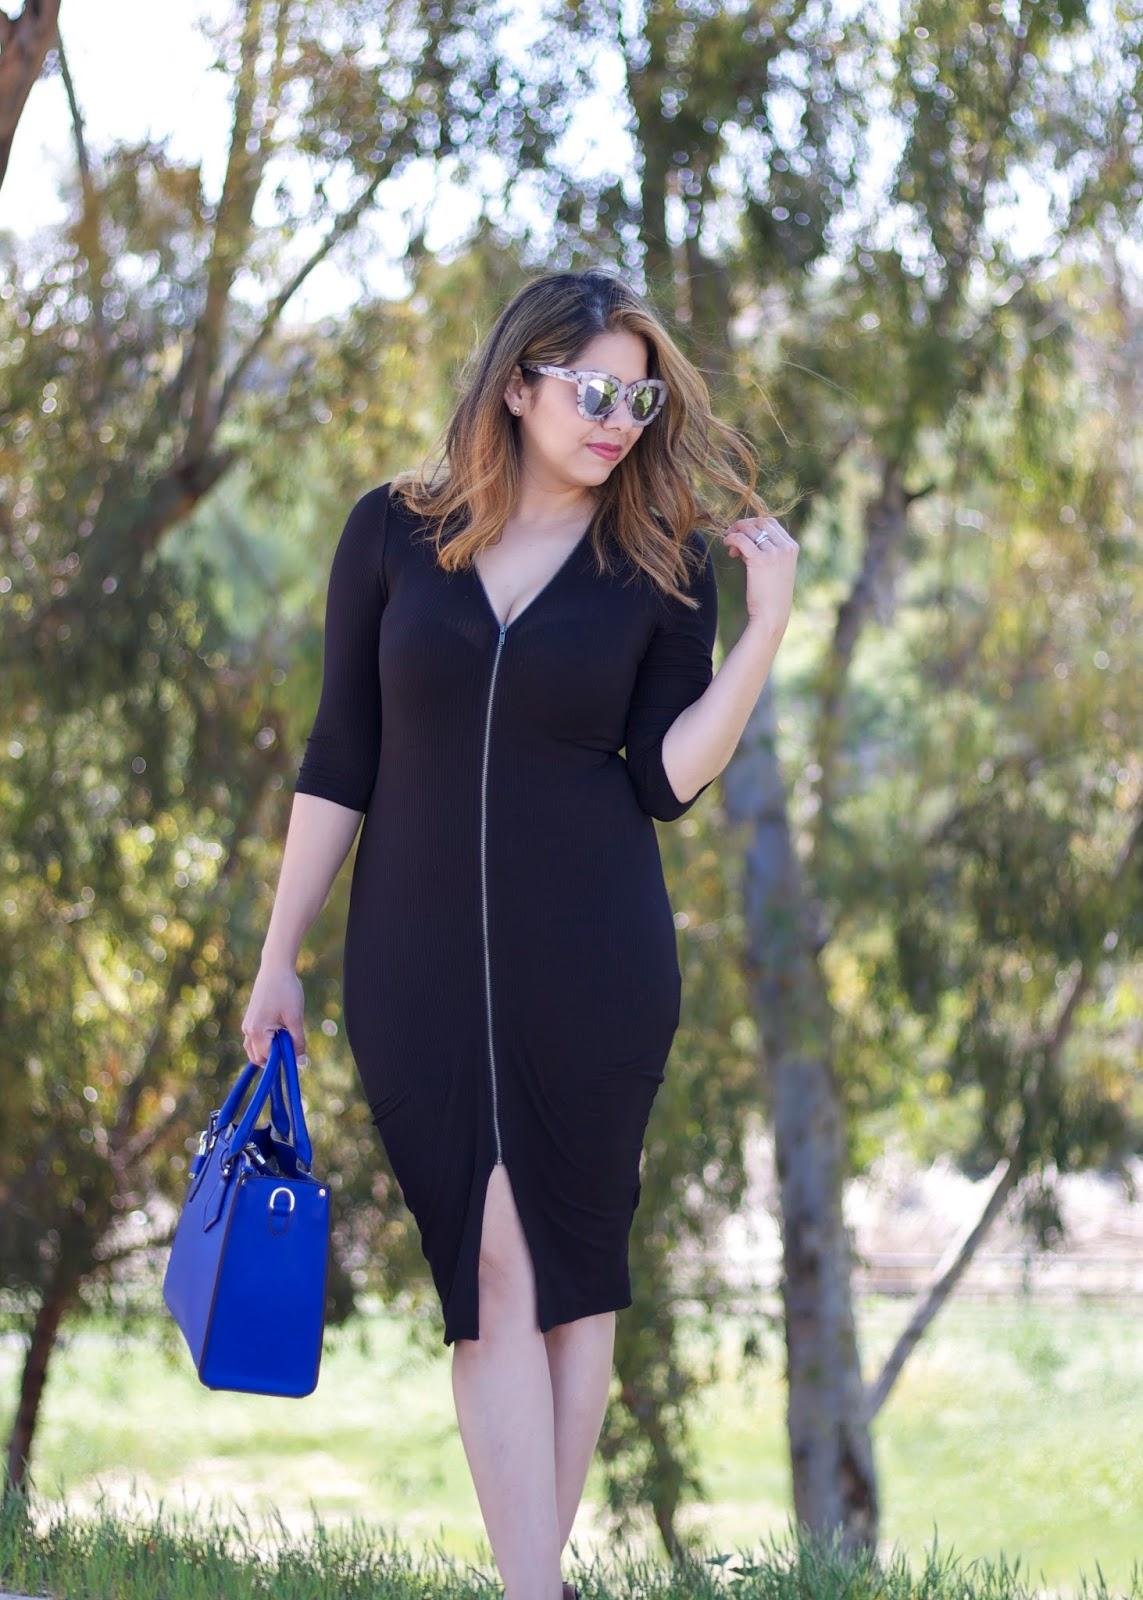 Black Midi Dress with blue, bold blue handbag, galian handbag, quay sunglasses